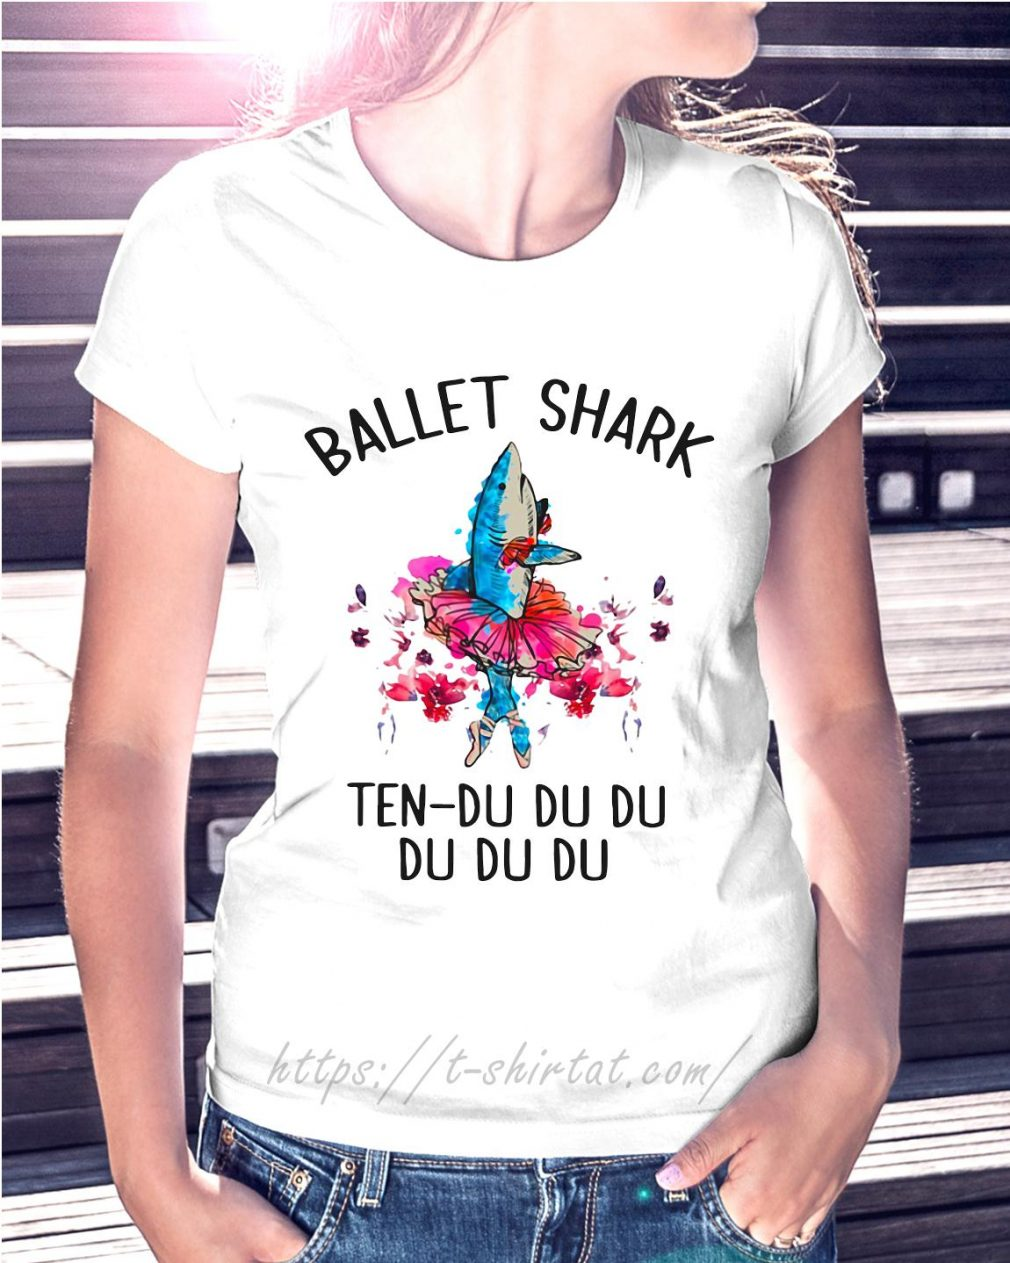 Ballet shark ten-du du du du du du Ladies Tee